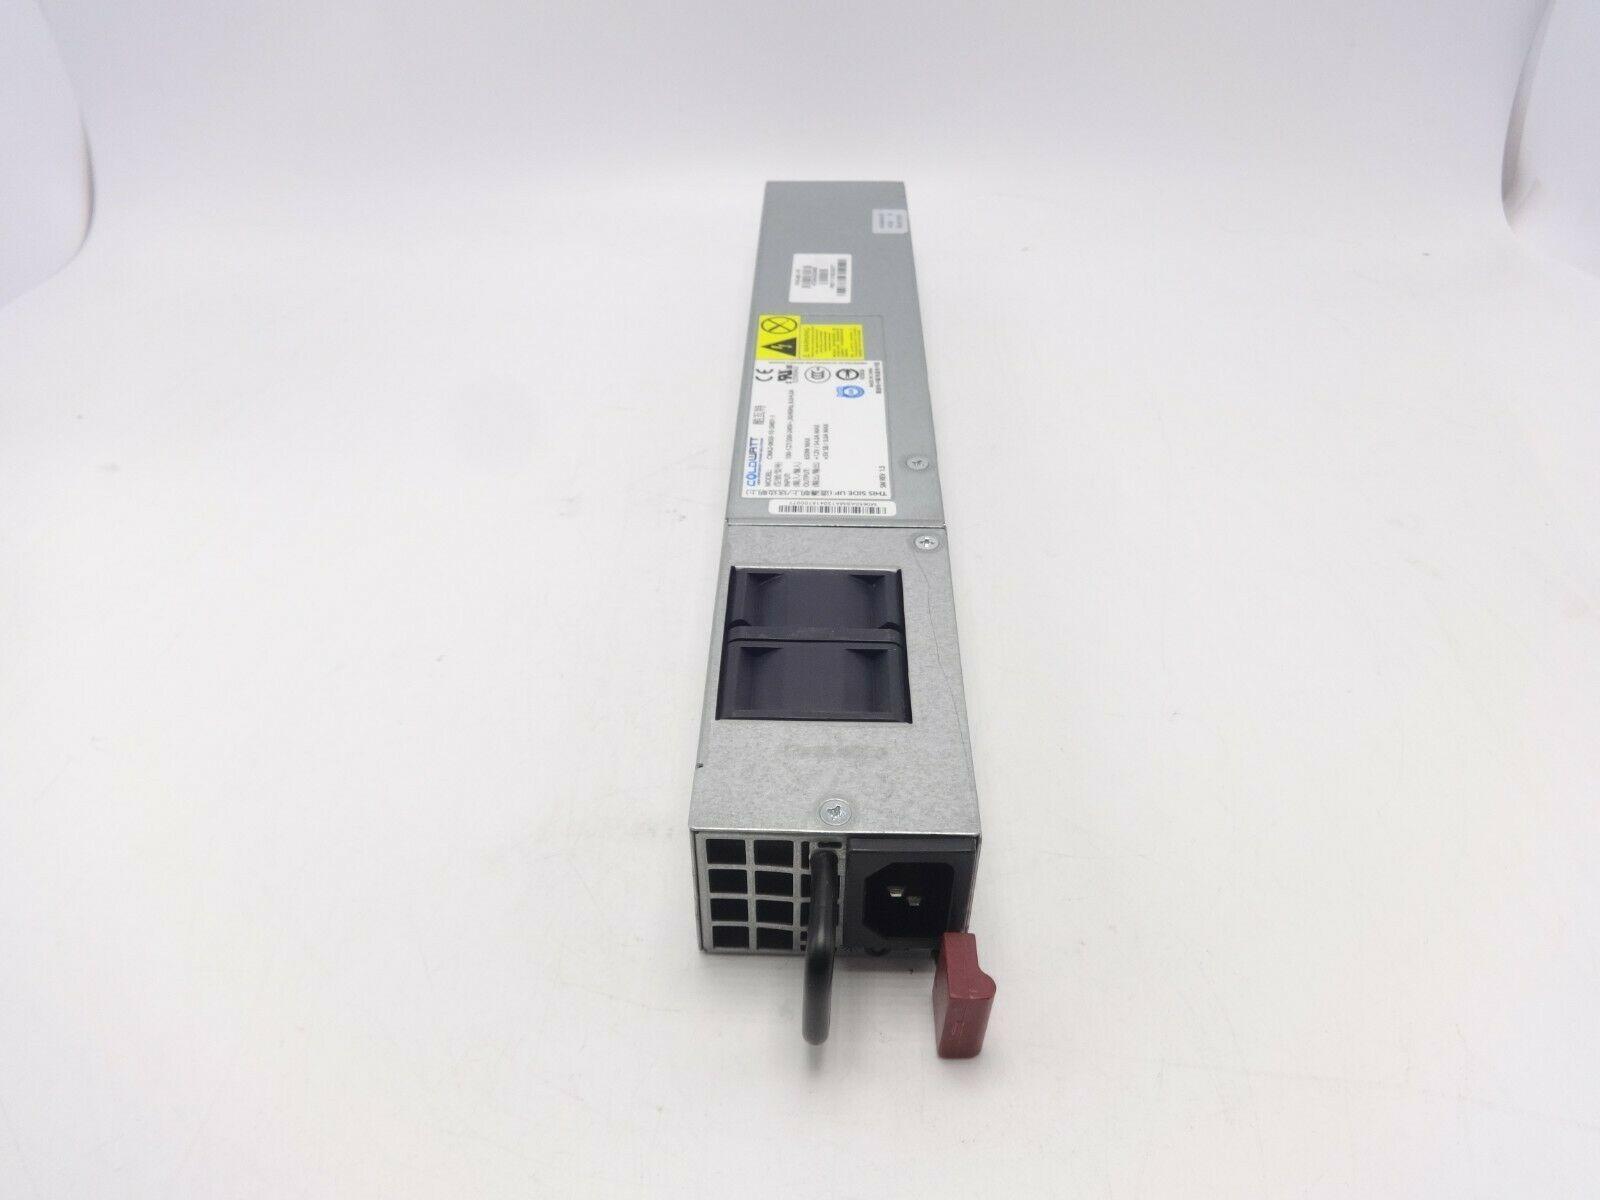 Supermicro PWS-651-1R 650Watt Power Supply - $29.04